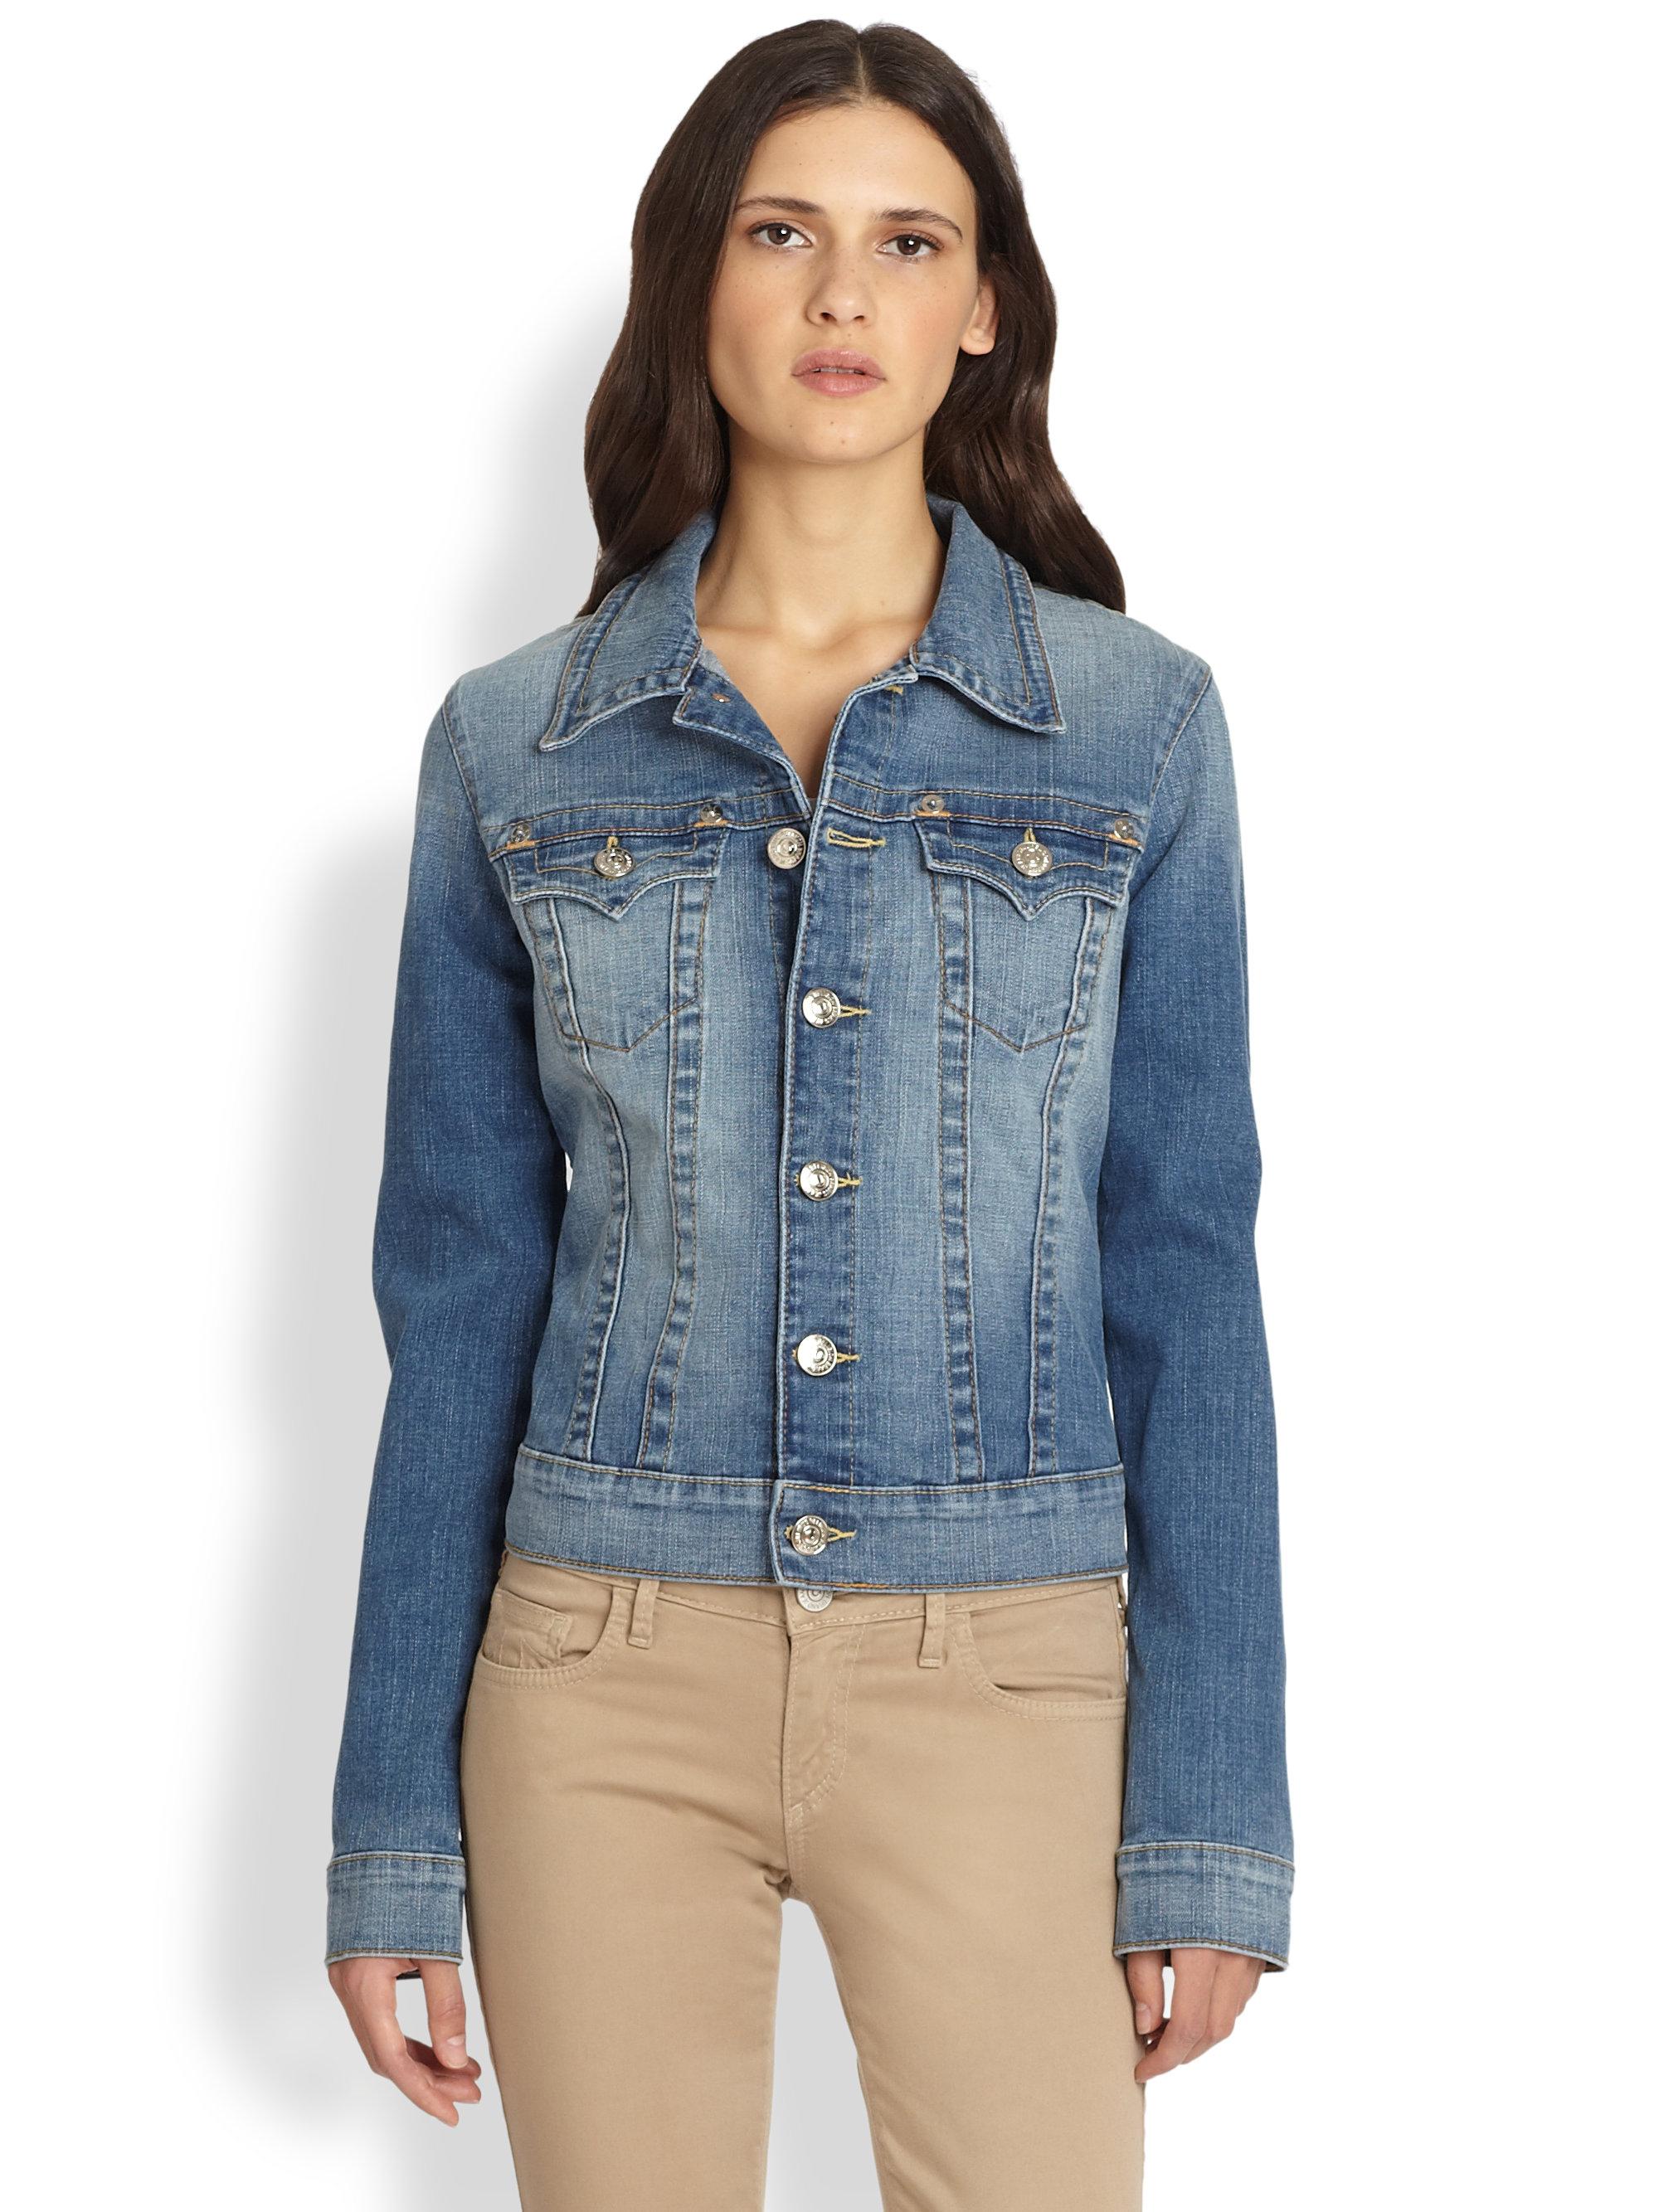 Lyst - True Religion Emily Denim Jacket in Blue - photo#8